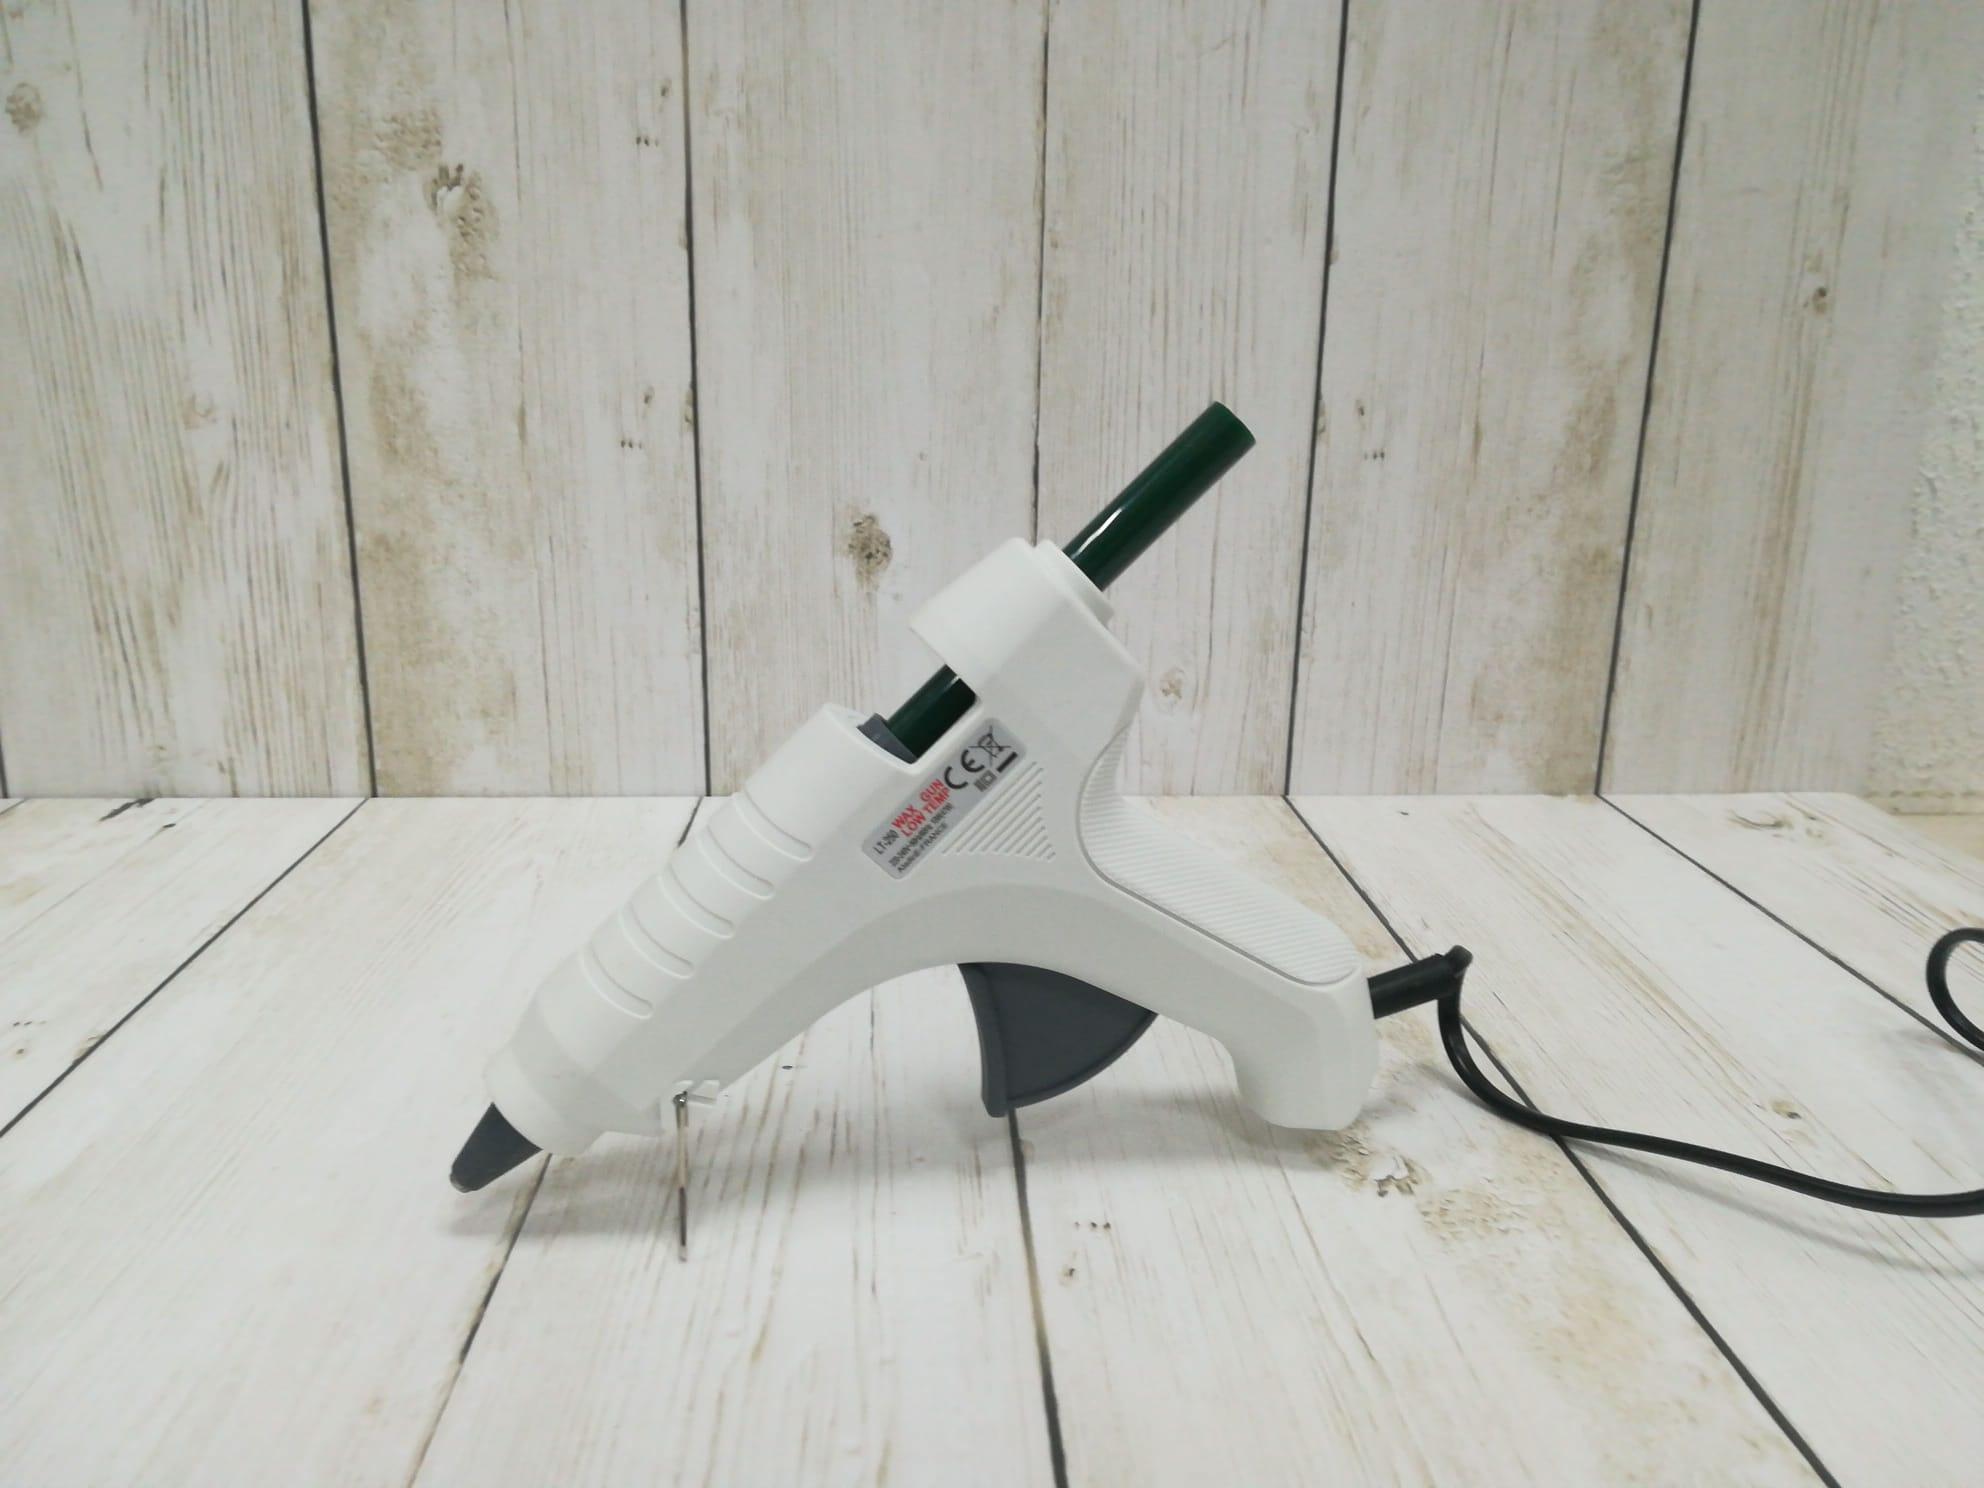 Pistola para derretir cera de lacre termofusible